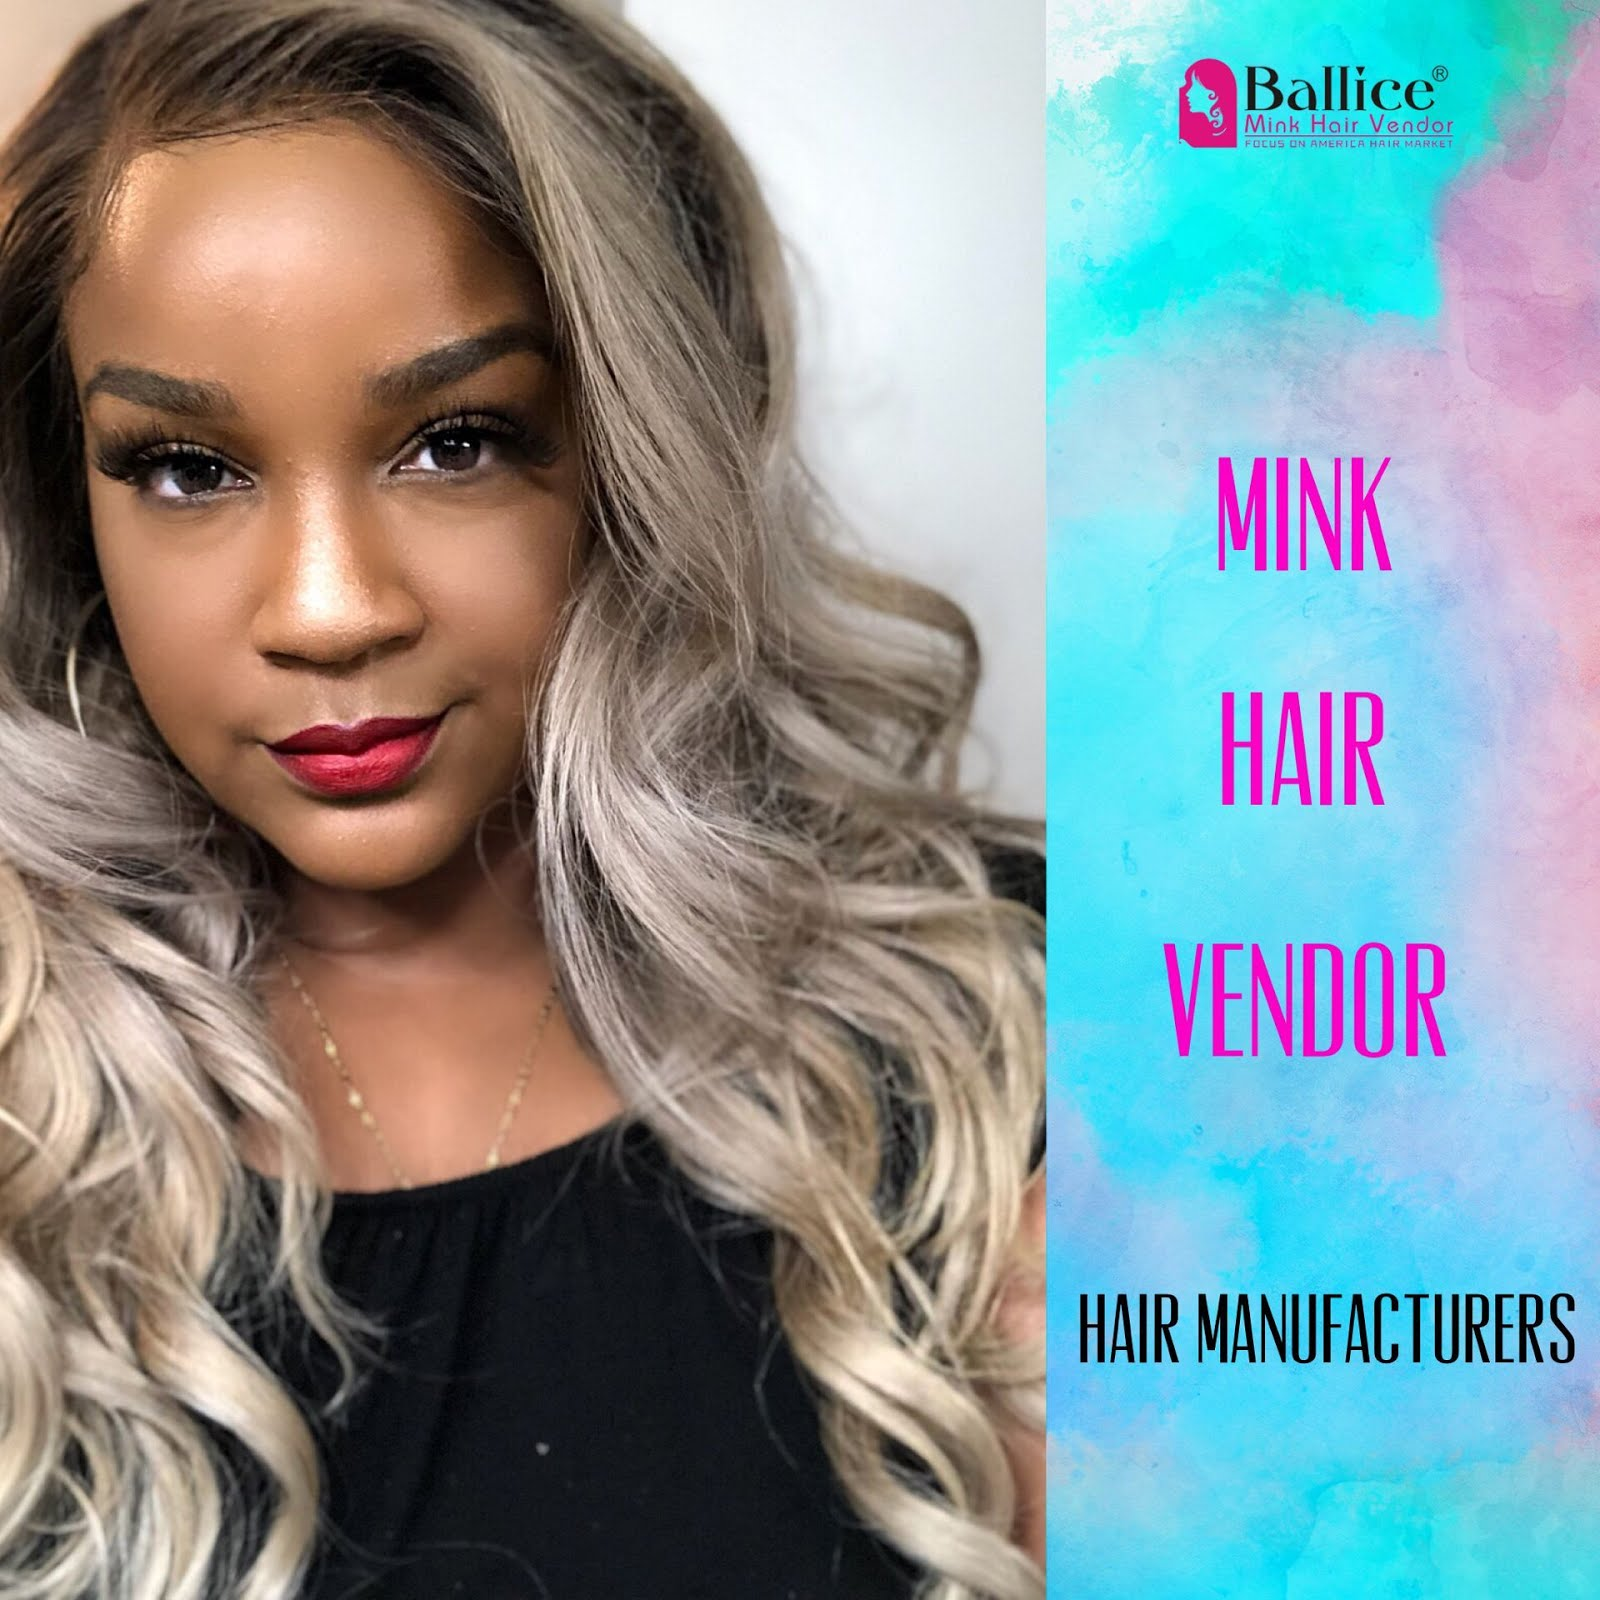 Ballice Mink Hair Vendor